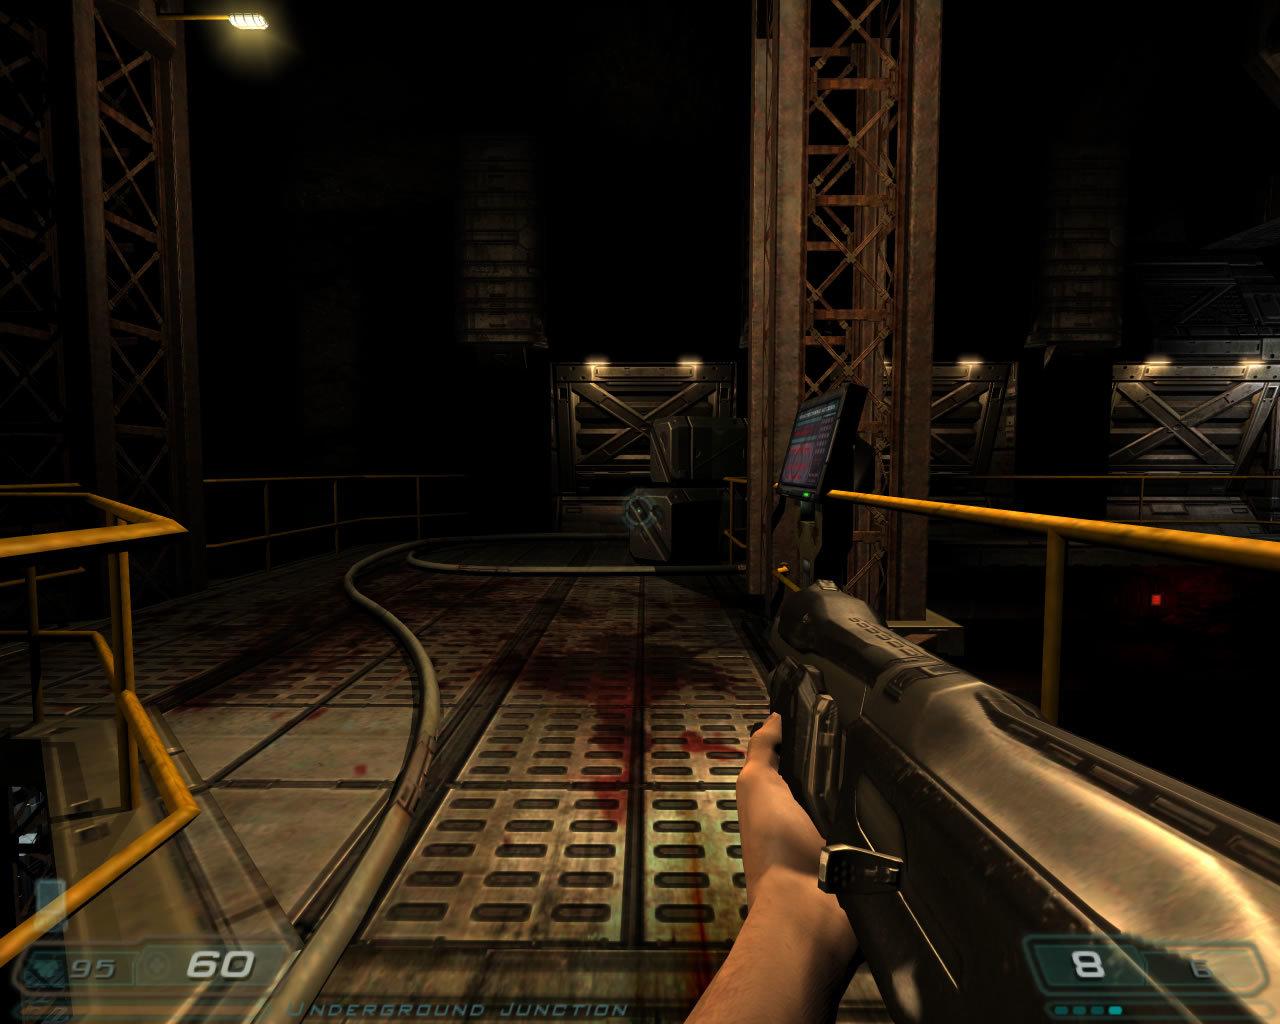 Doom 3 High Quality w/ 16x AA